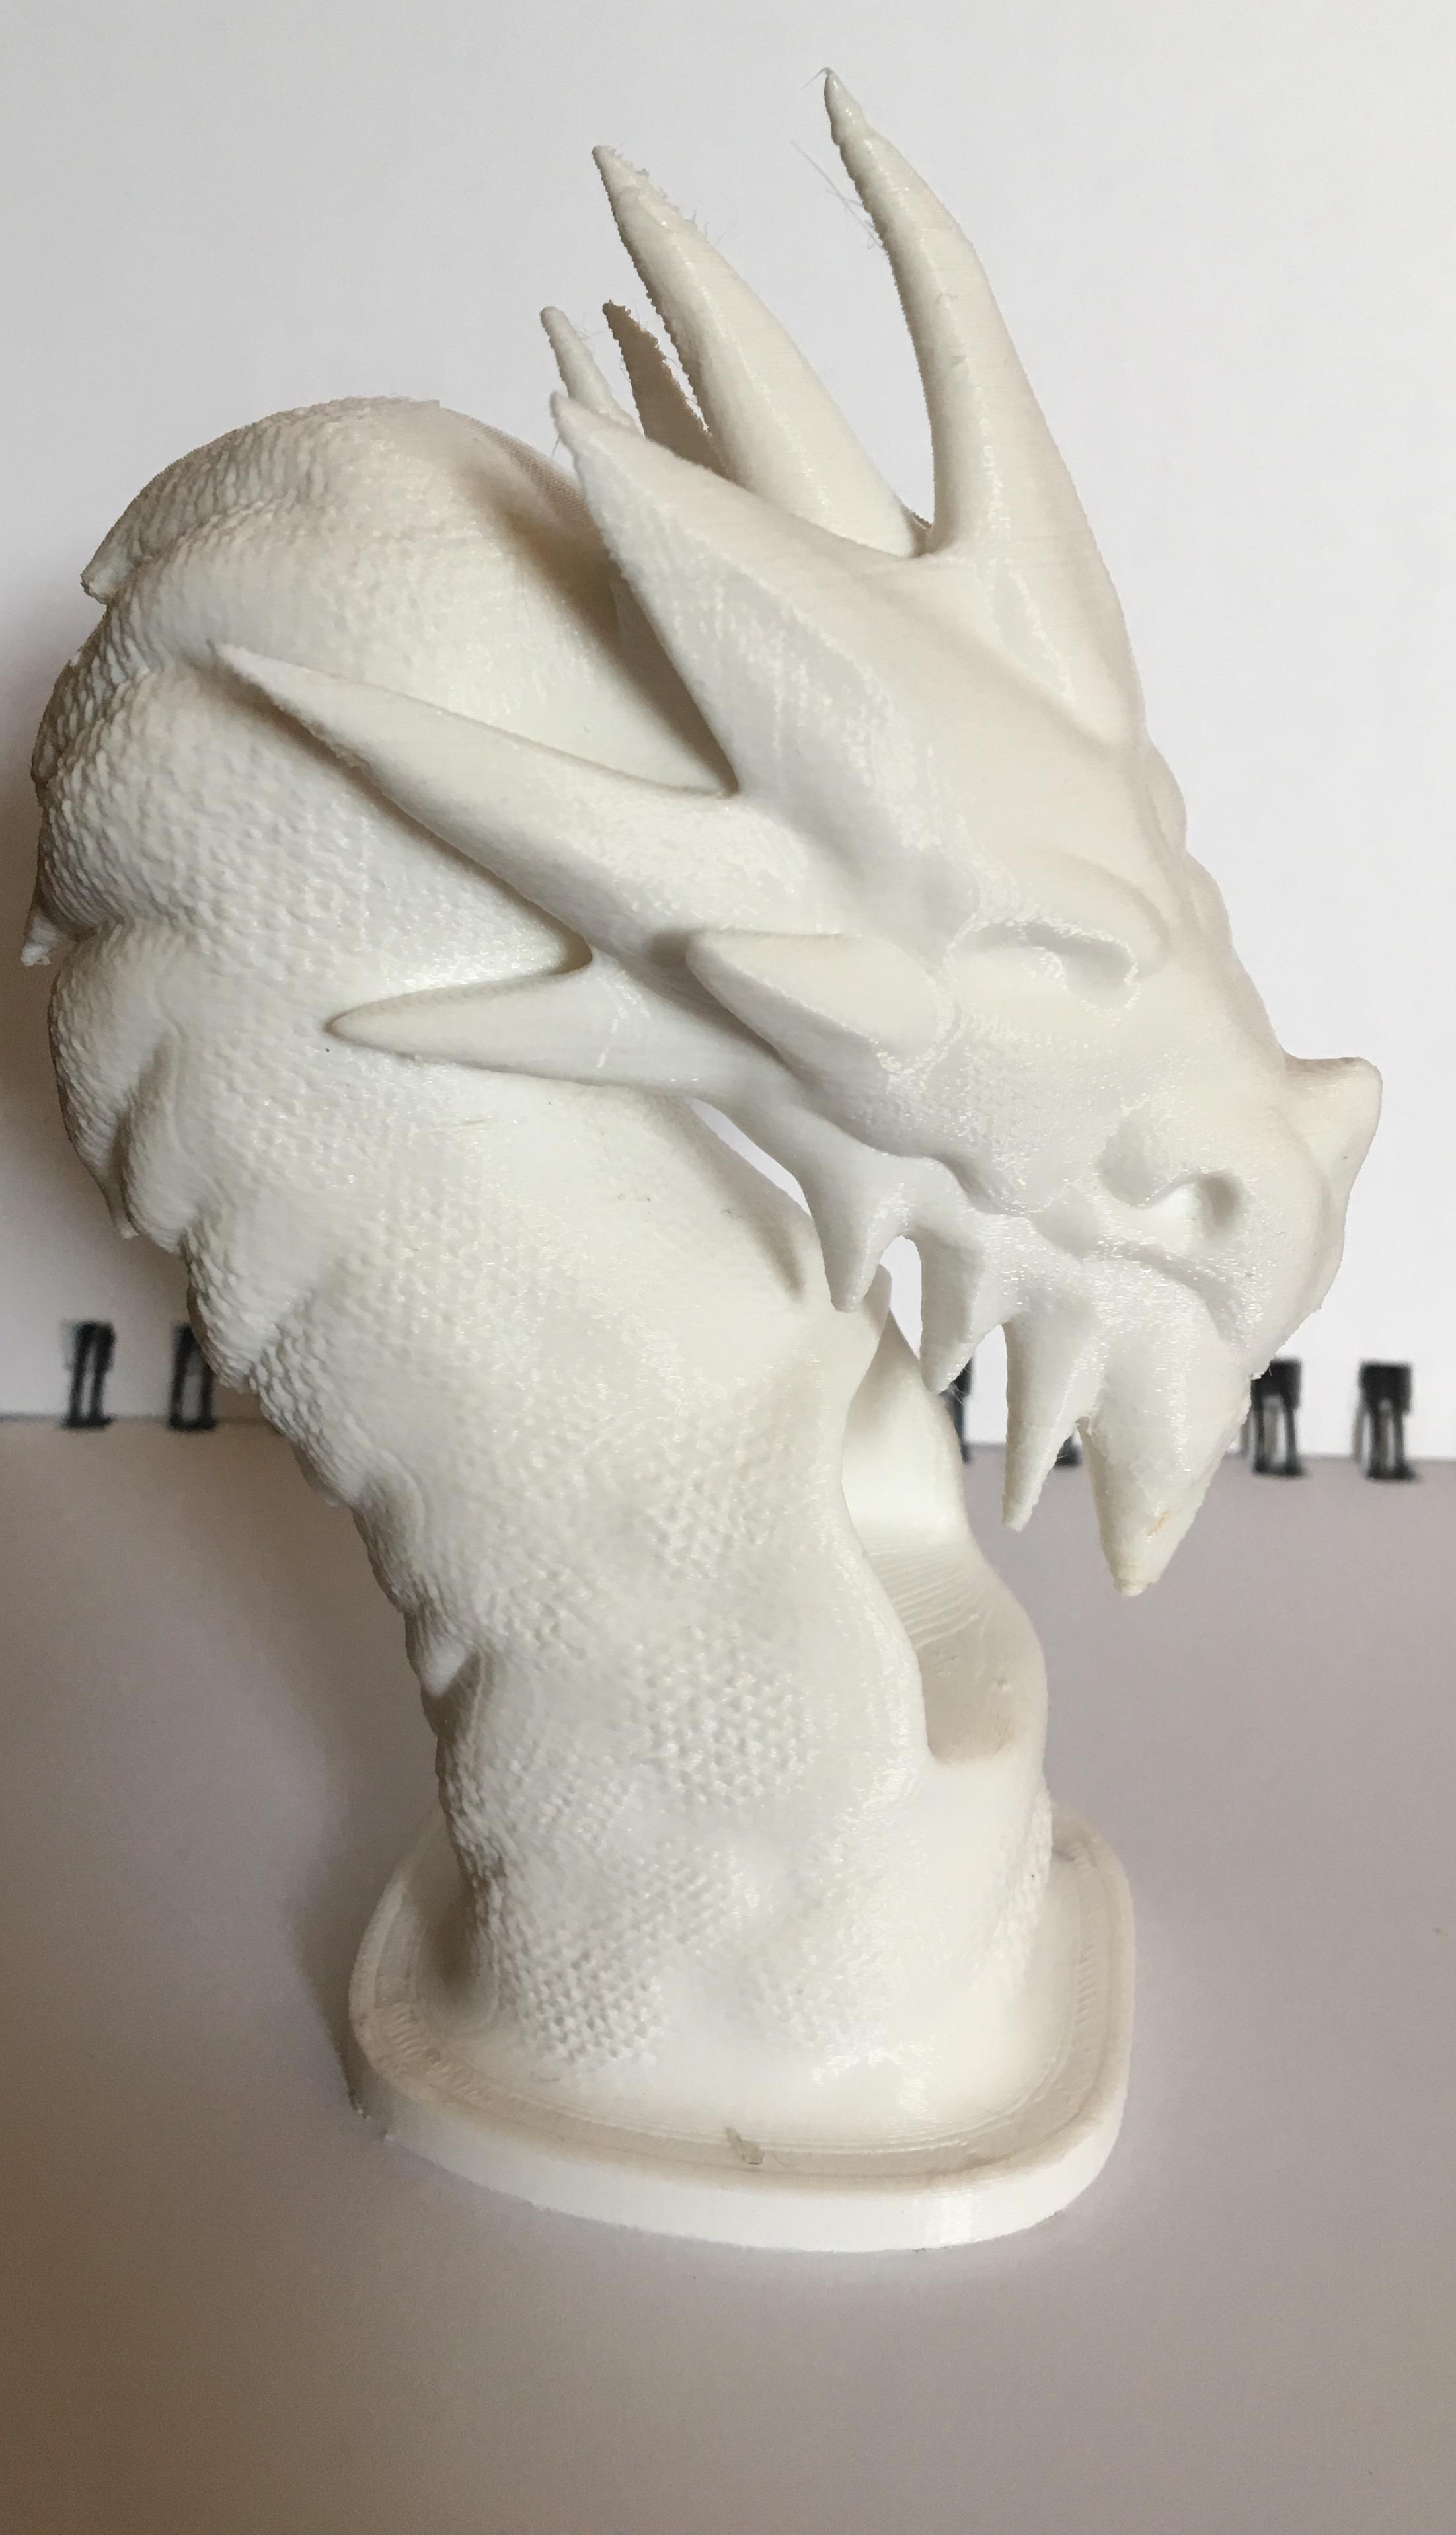 3D printed Dragon